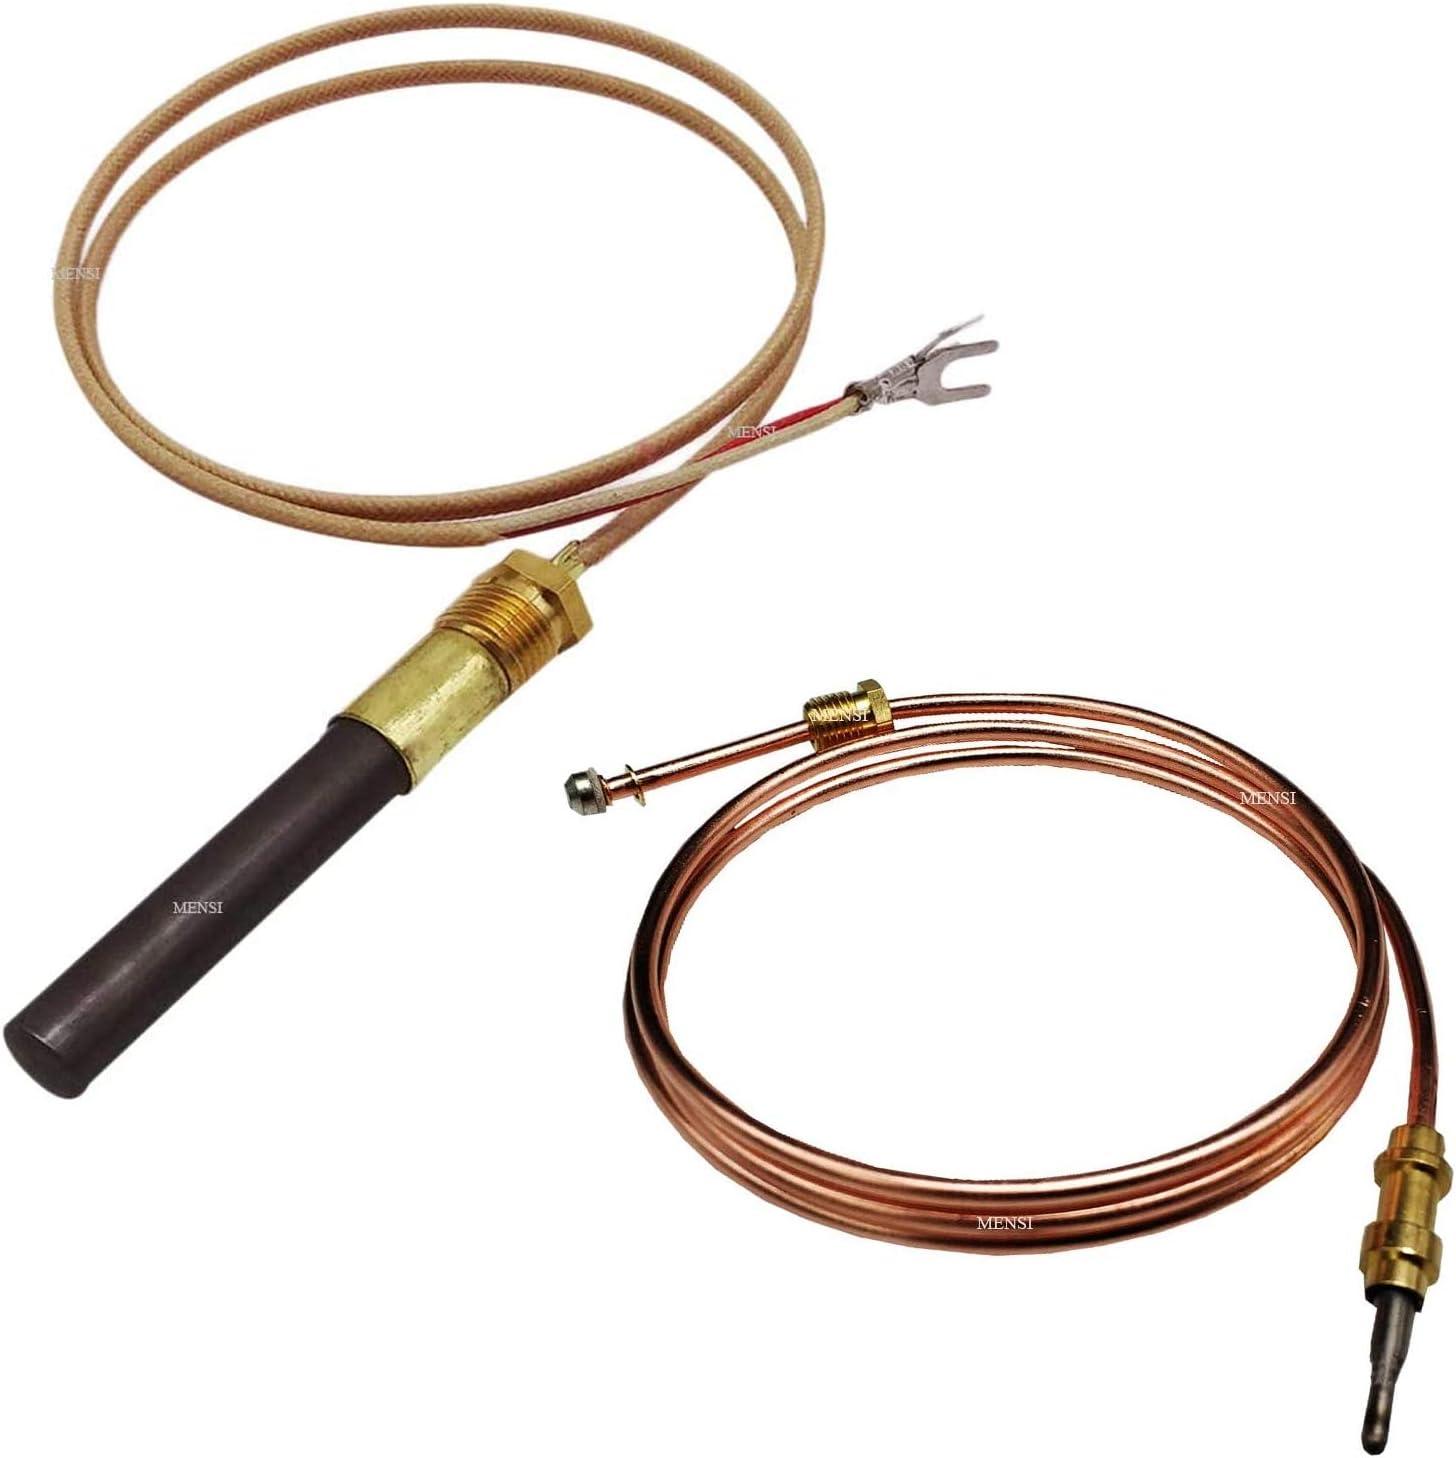 MENSI Propane Gas Fireplace Replacement Thermocoupler Temperature Sensor Minivolt Thermopile Kit